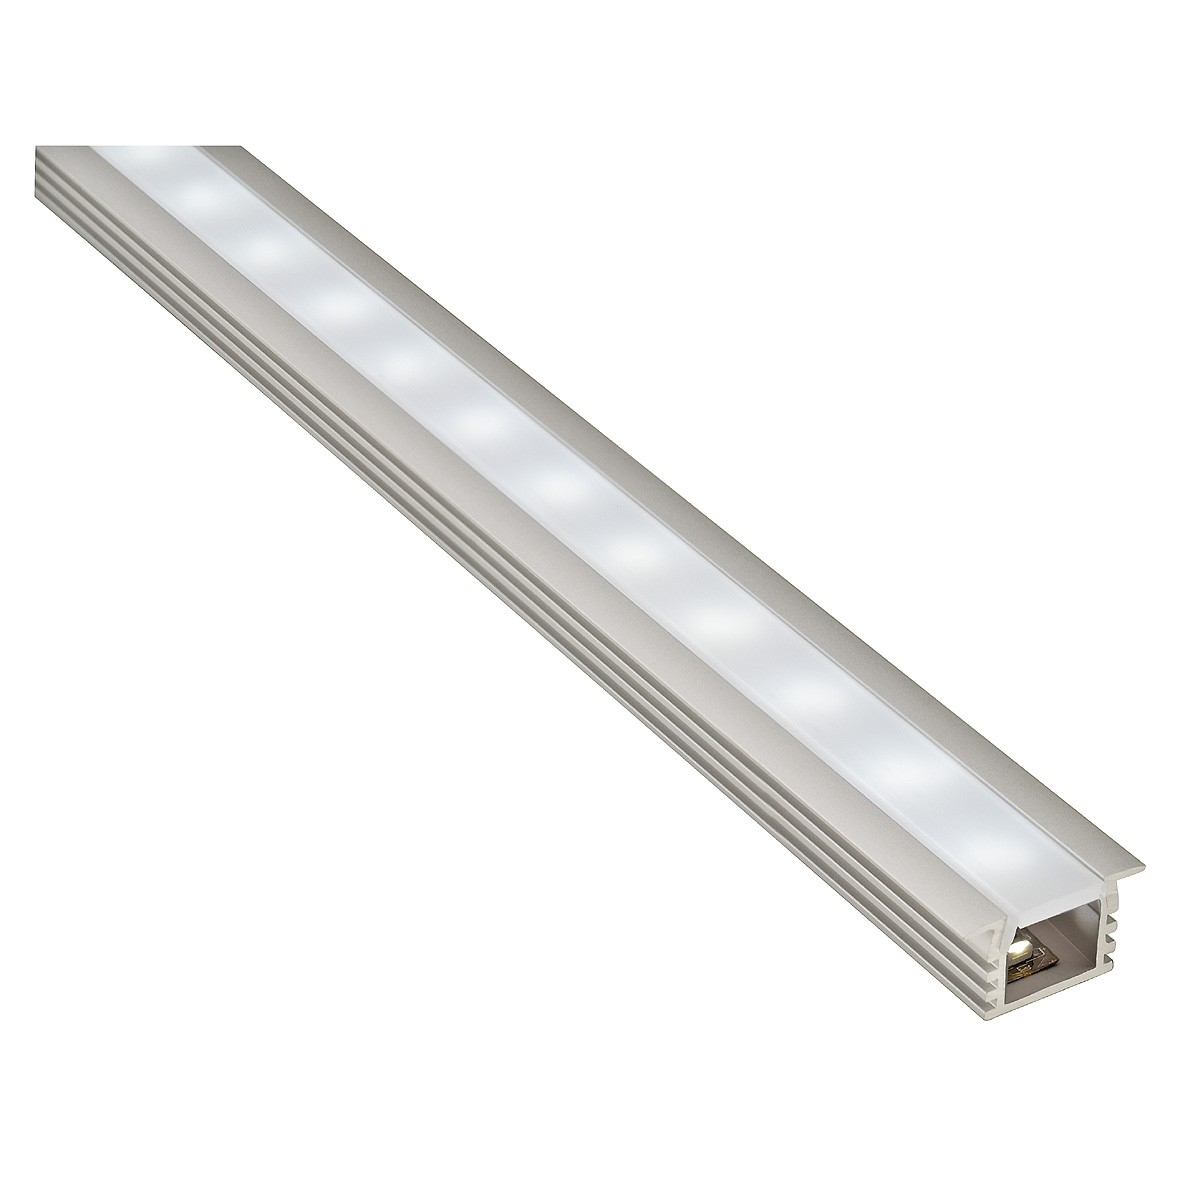 Recessed Mini Led Lighting : Recessed led mini profile metre lengths